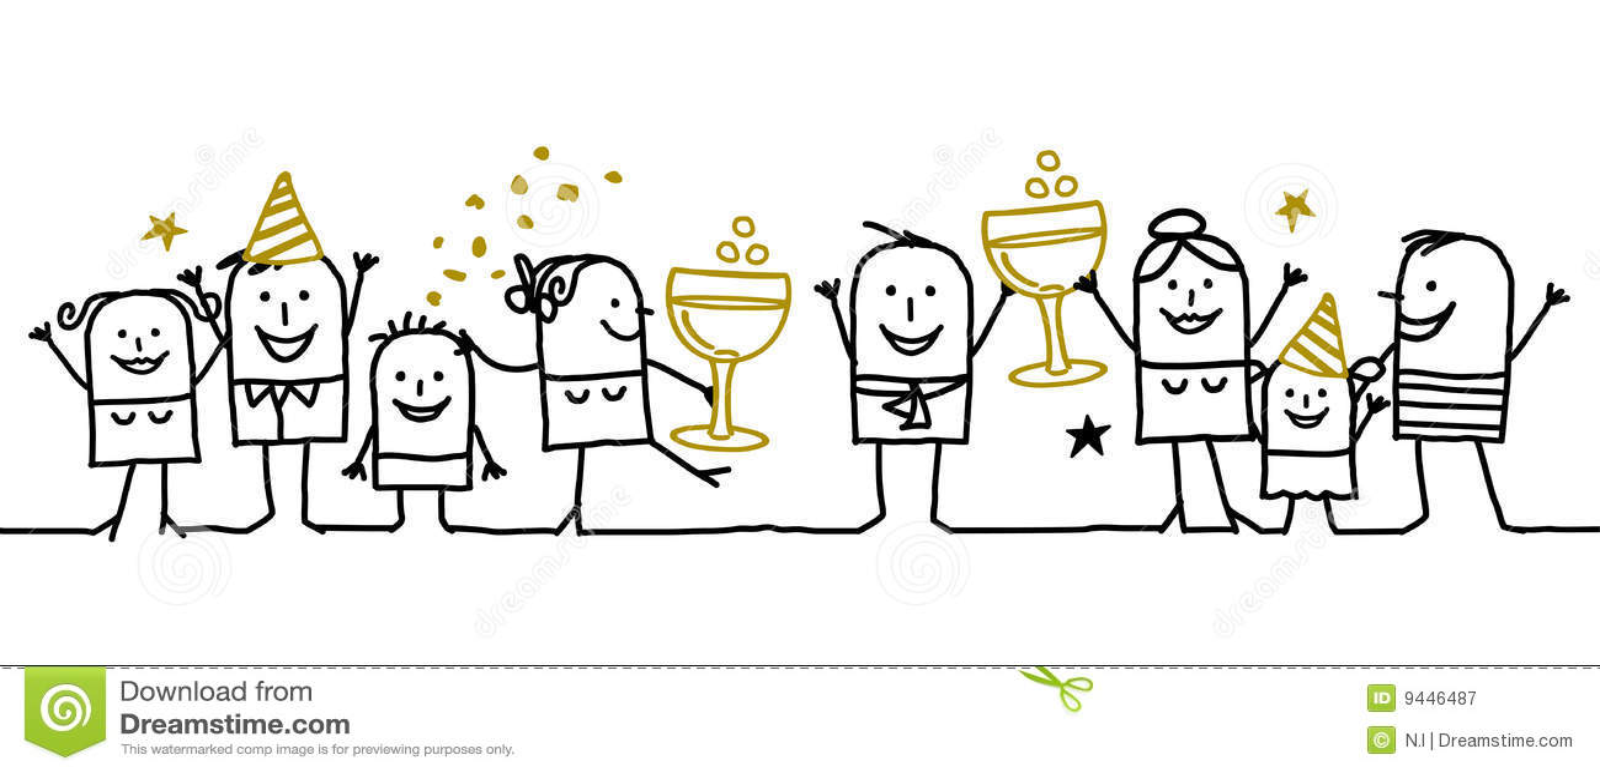 Happy New year ! stock vector. Illustration of festive - 9446487